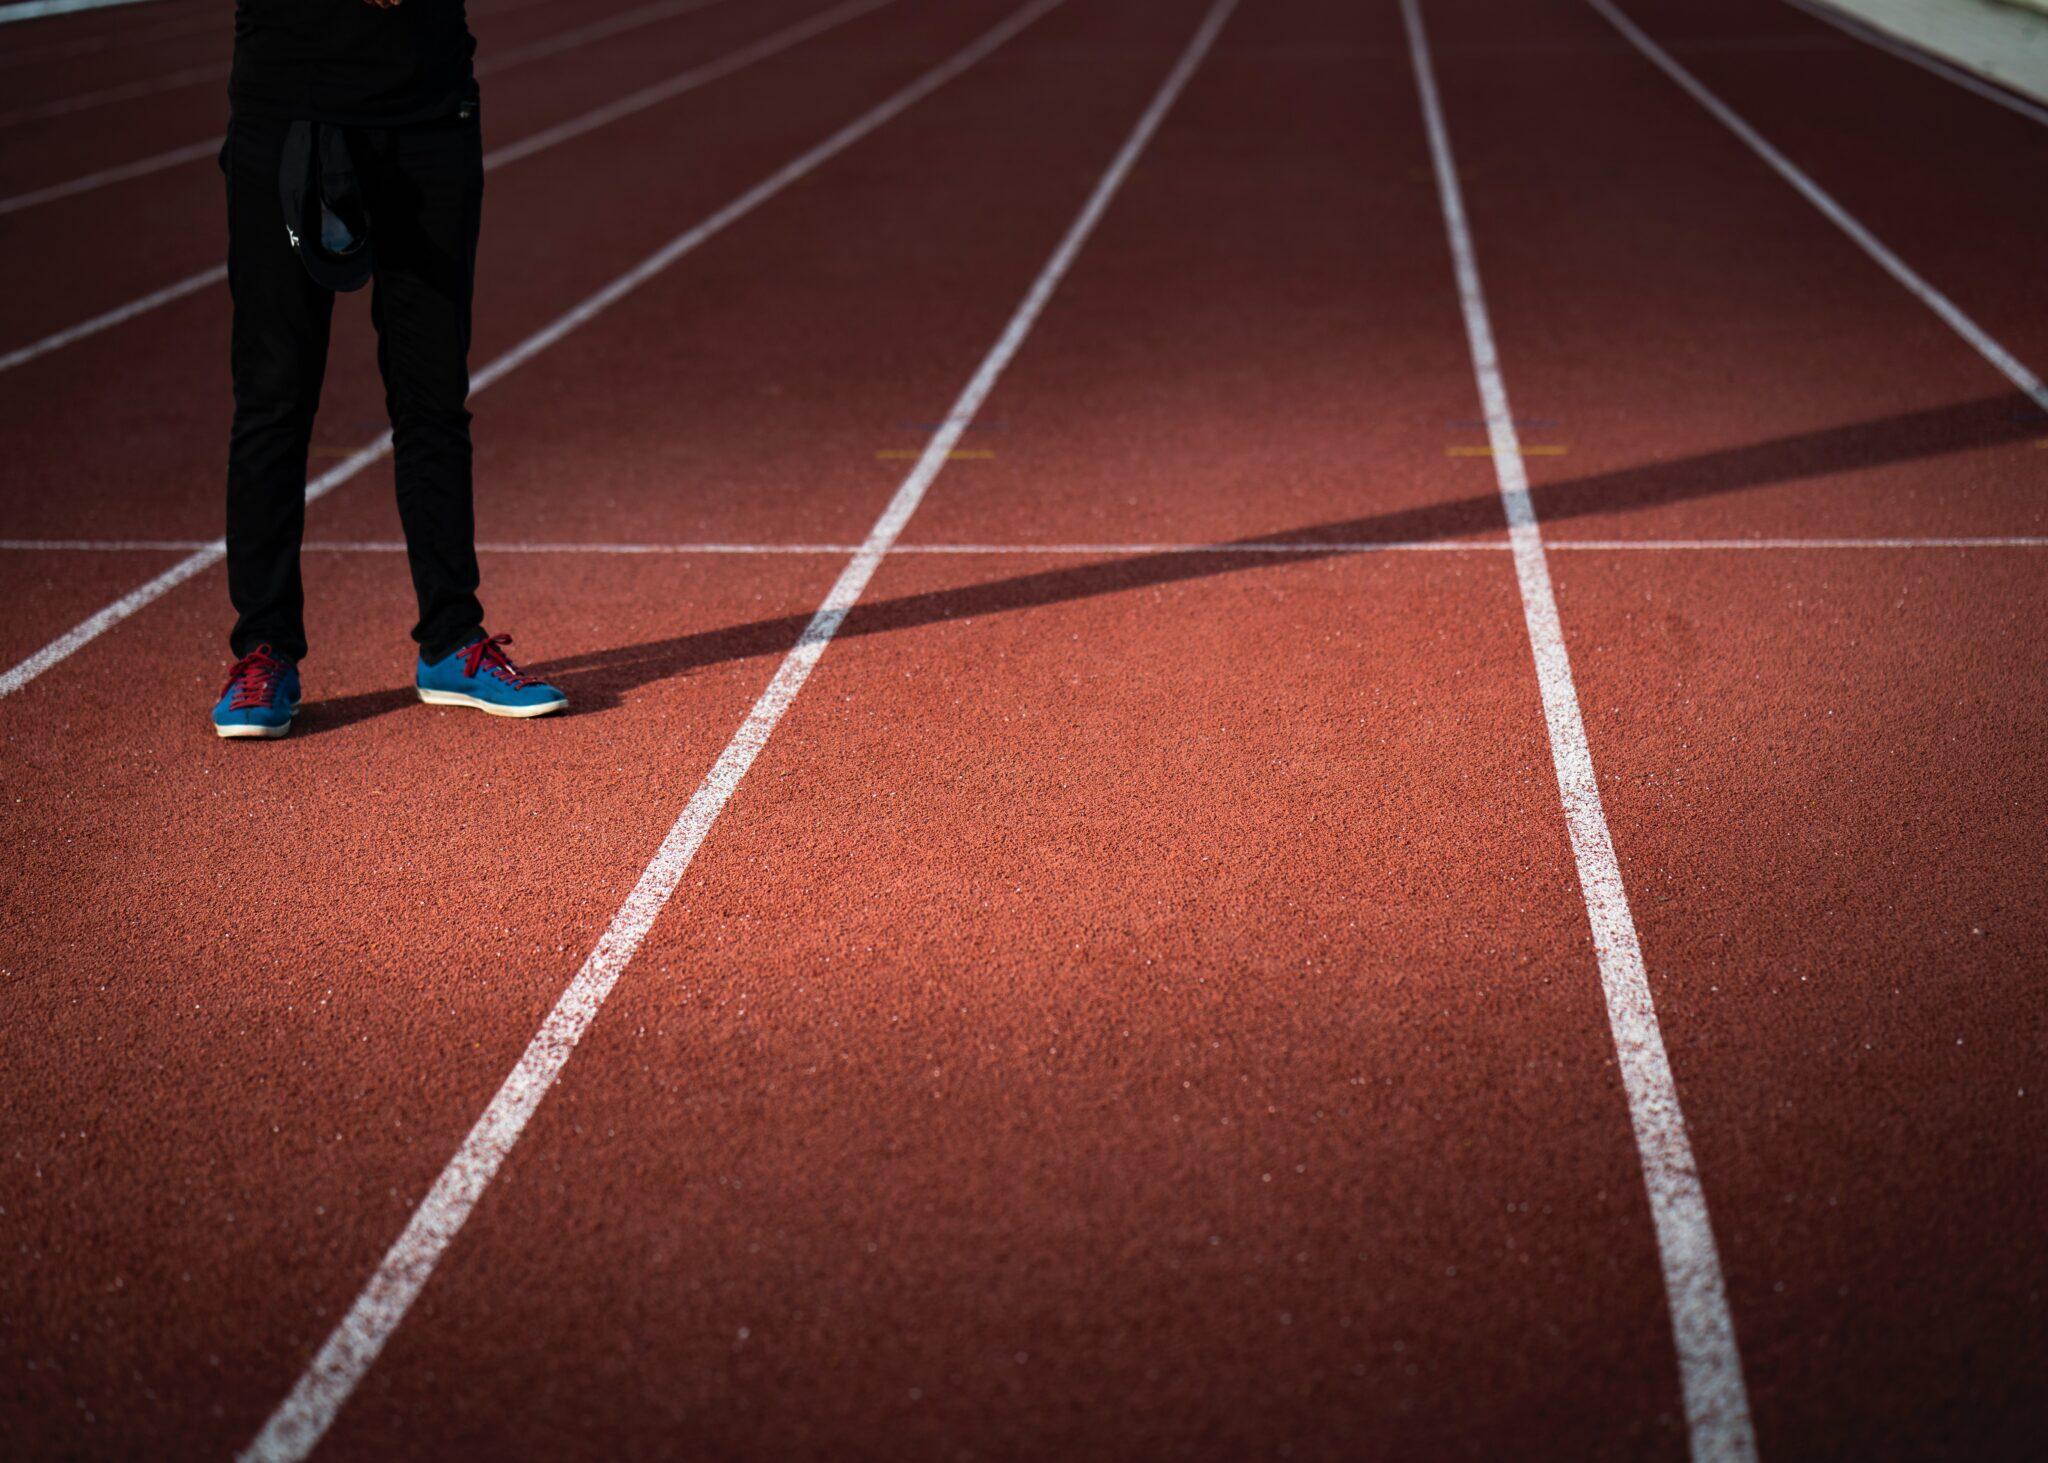 A running track